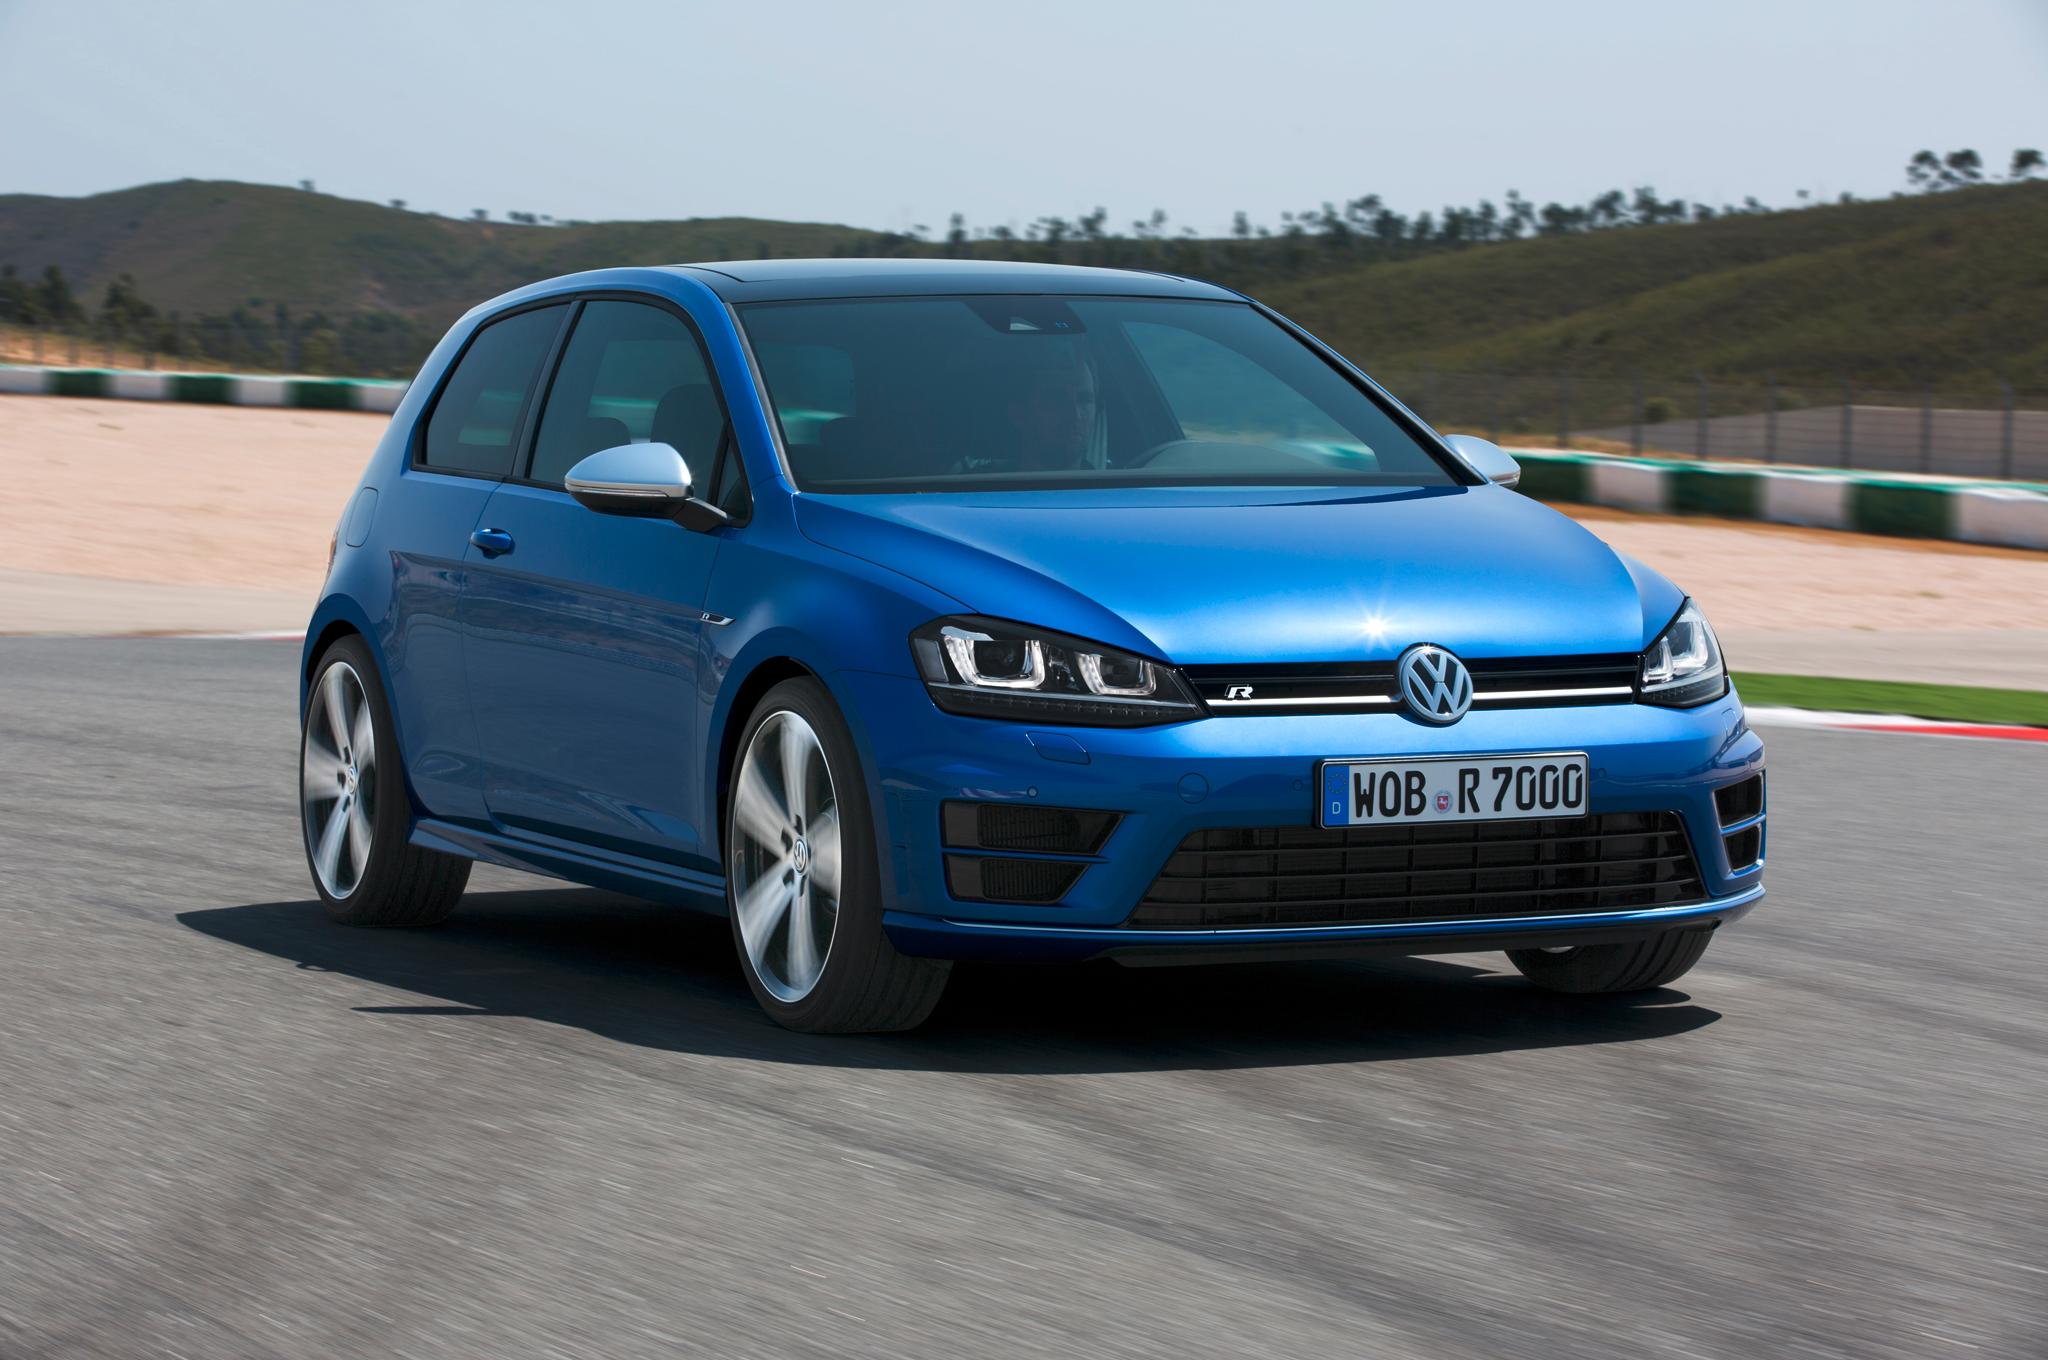 2015 Volkswagen Golf HD Images Wallpaper Attachment 3657   Grivucom 2048x1360